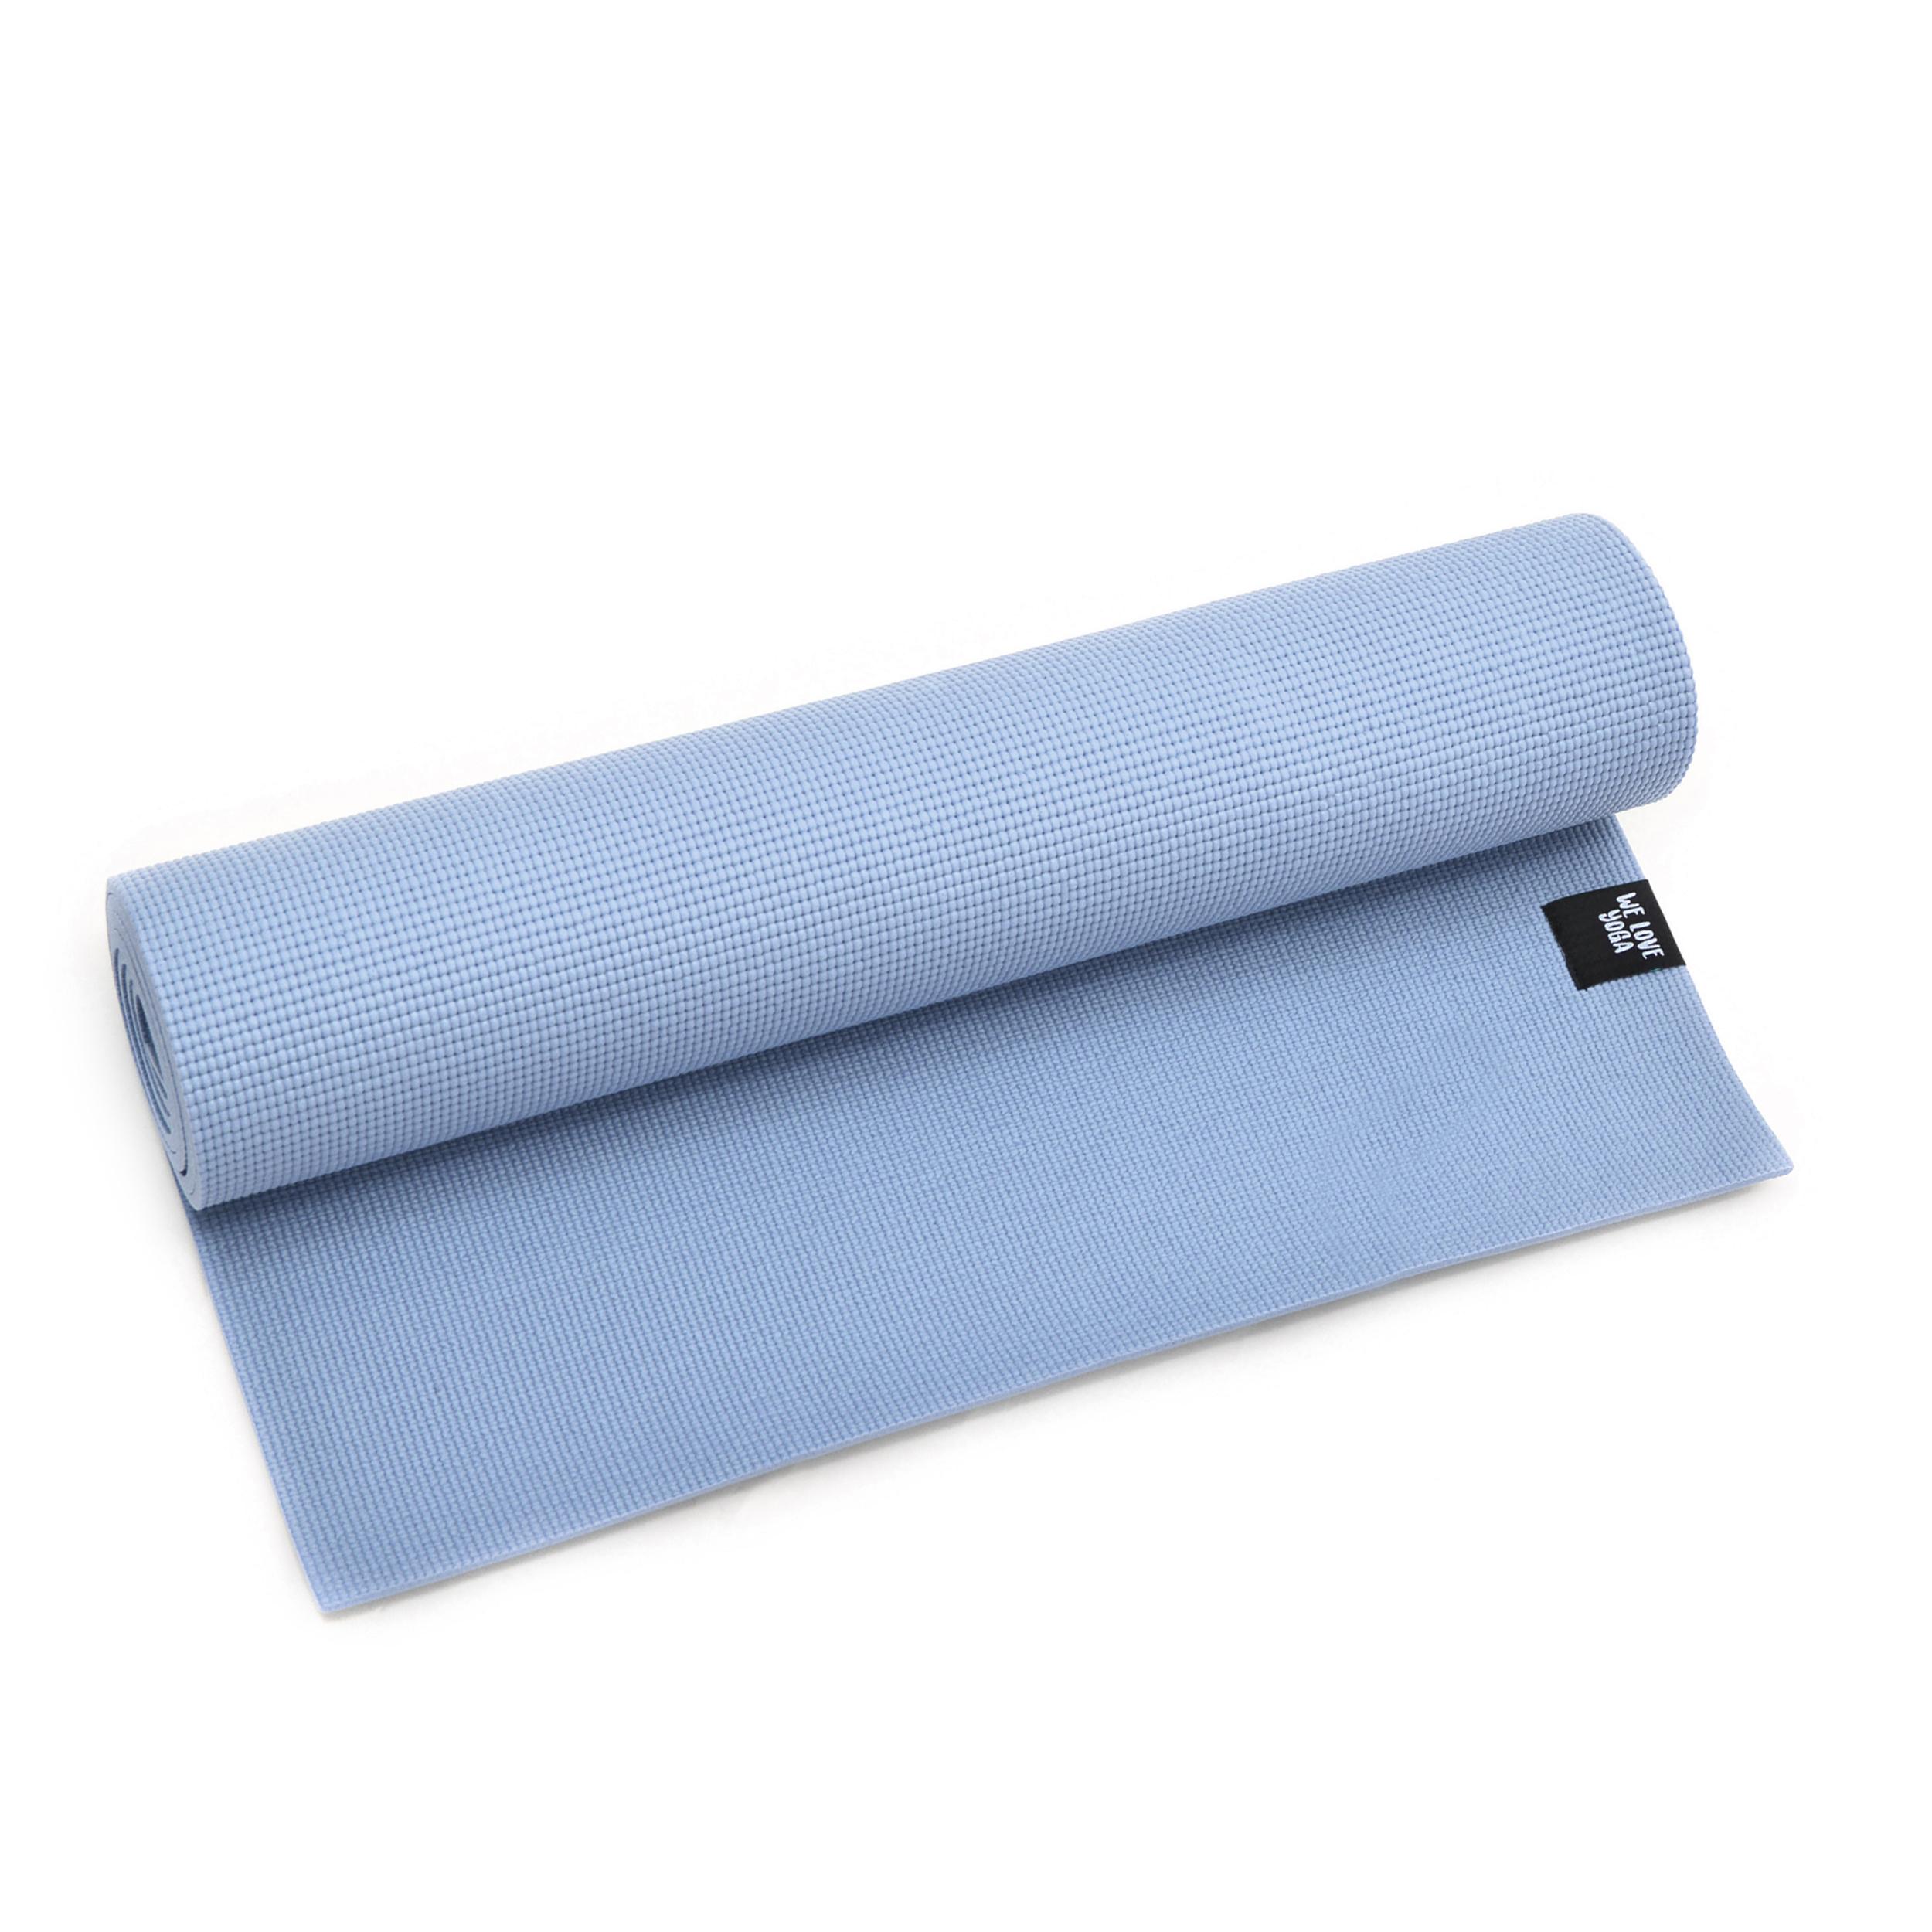 Zen Power PVC Yogamatte, für Yoga, Pilates, Gymnastik, Farbe: Hellblau/Serenity